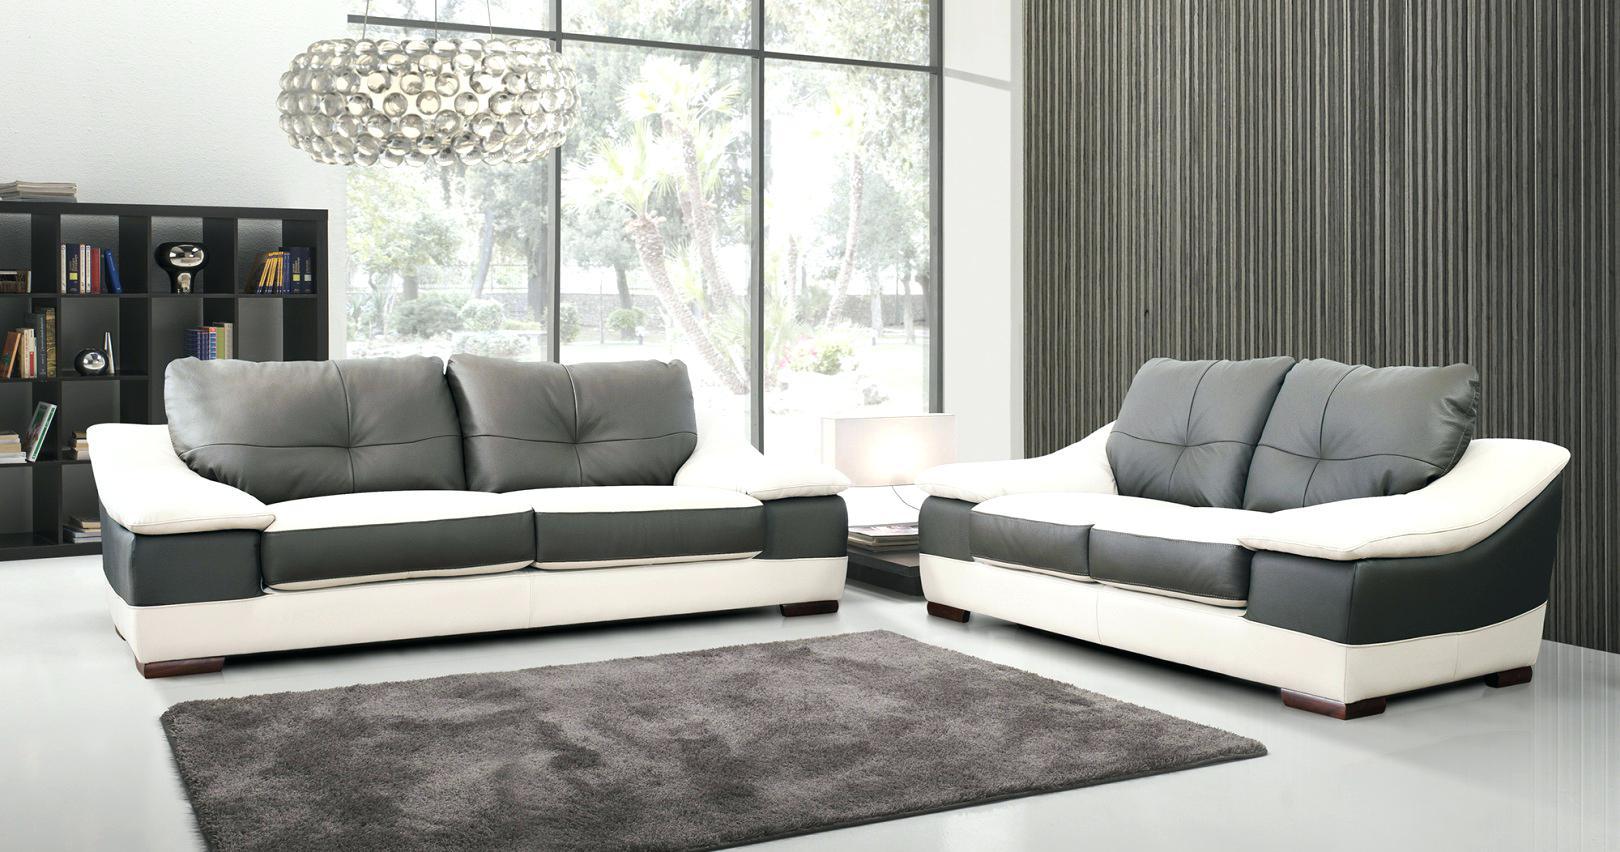 Canape Cuir Italien solde Inspirant Stock Canap Italien Pas Cher 33 Avec Design D Int Rieur Canape Cuir Tissu